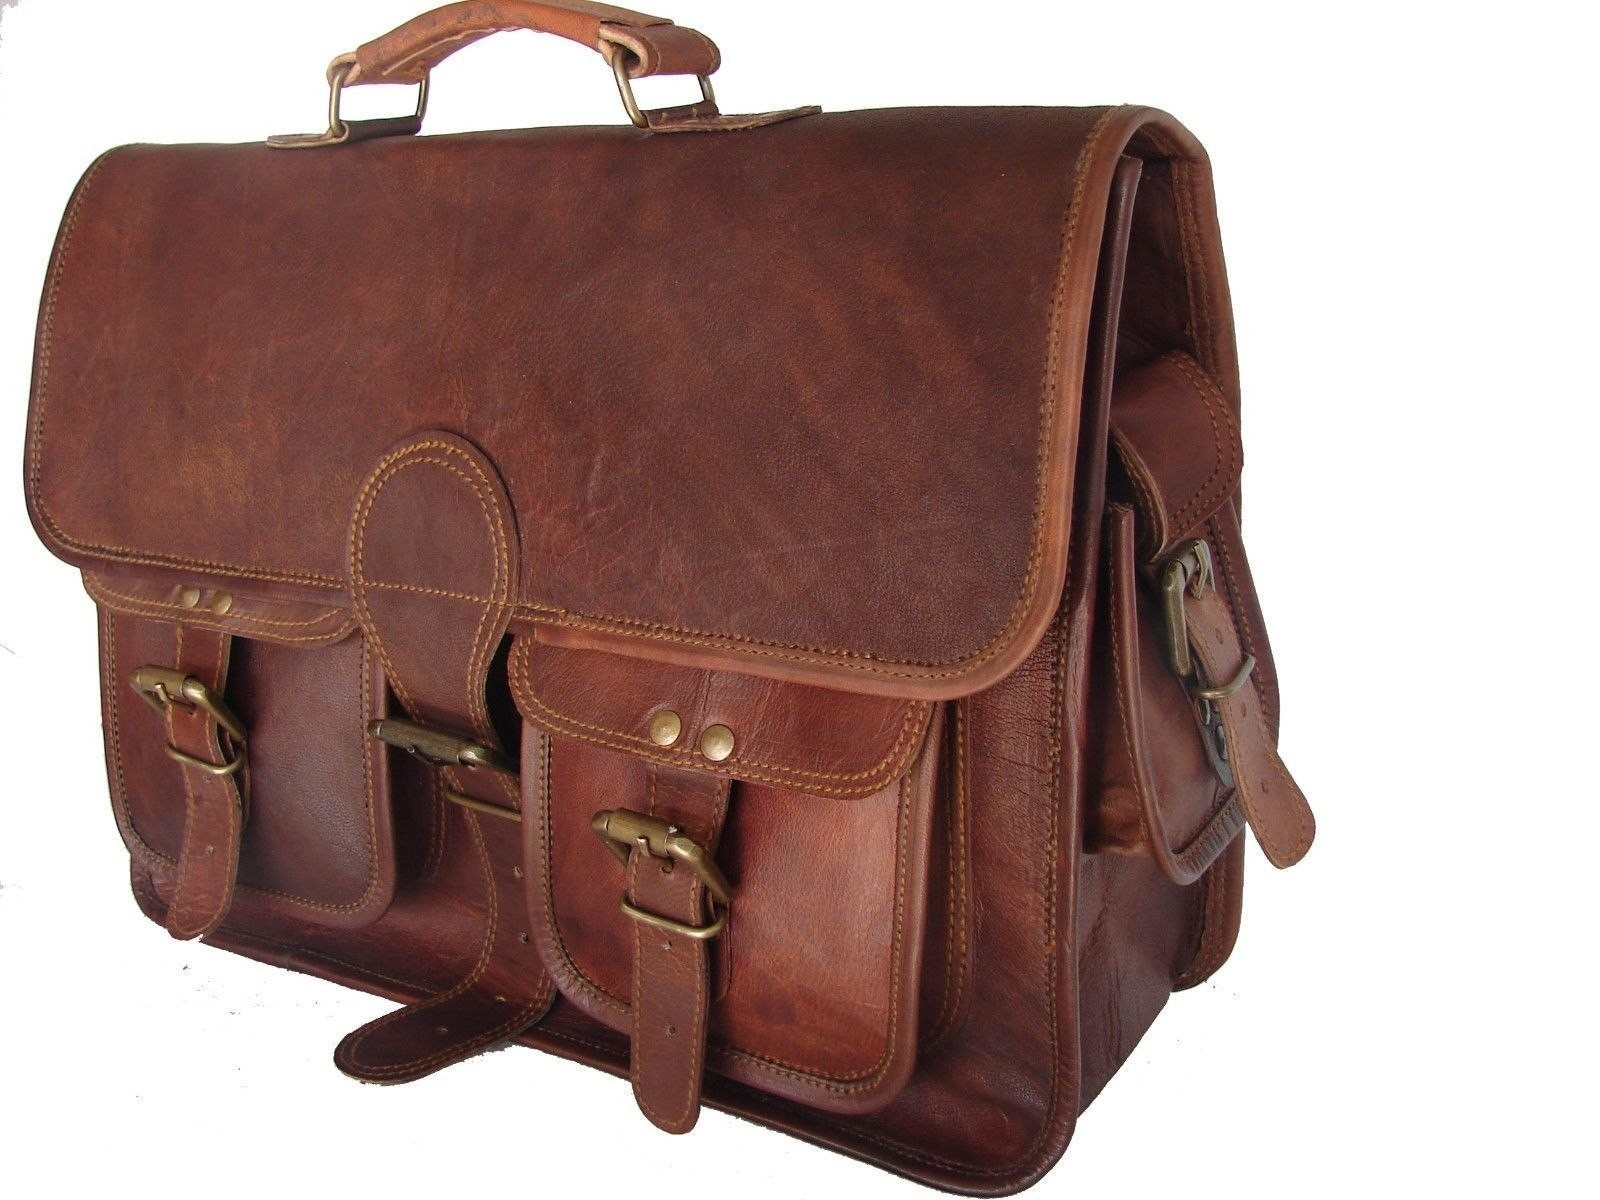 90c49c357bb70 Skórzana teczka listonoszka BUSINESS MARK 4™ torba na ramię męska